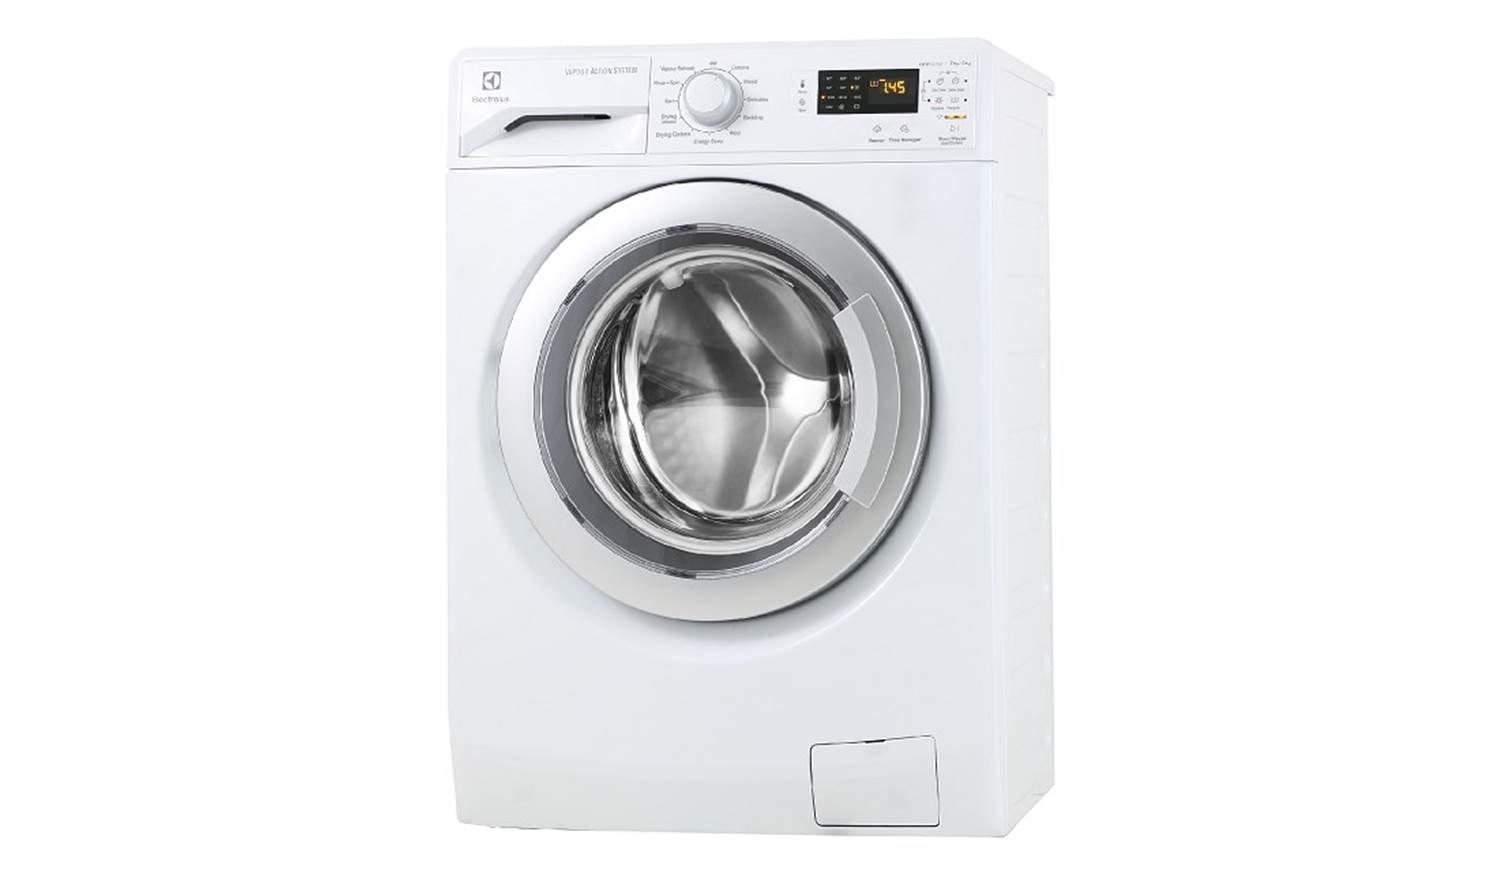 electrolux 7 5kg front load washing machine. electrolux eww12753 7/5kg washer dryer 7 5kg front load washing machine